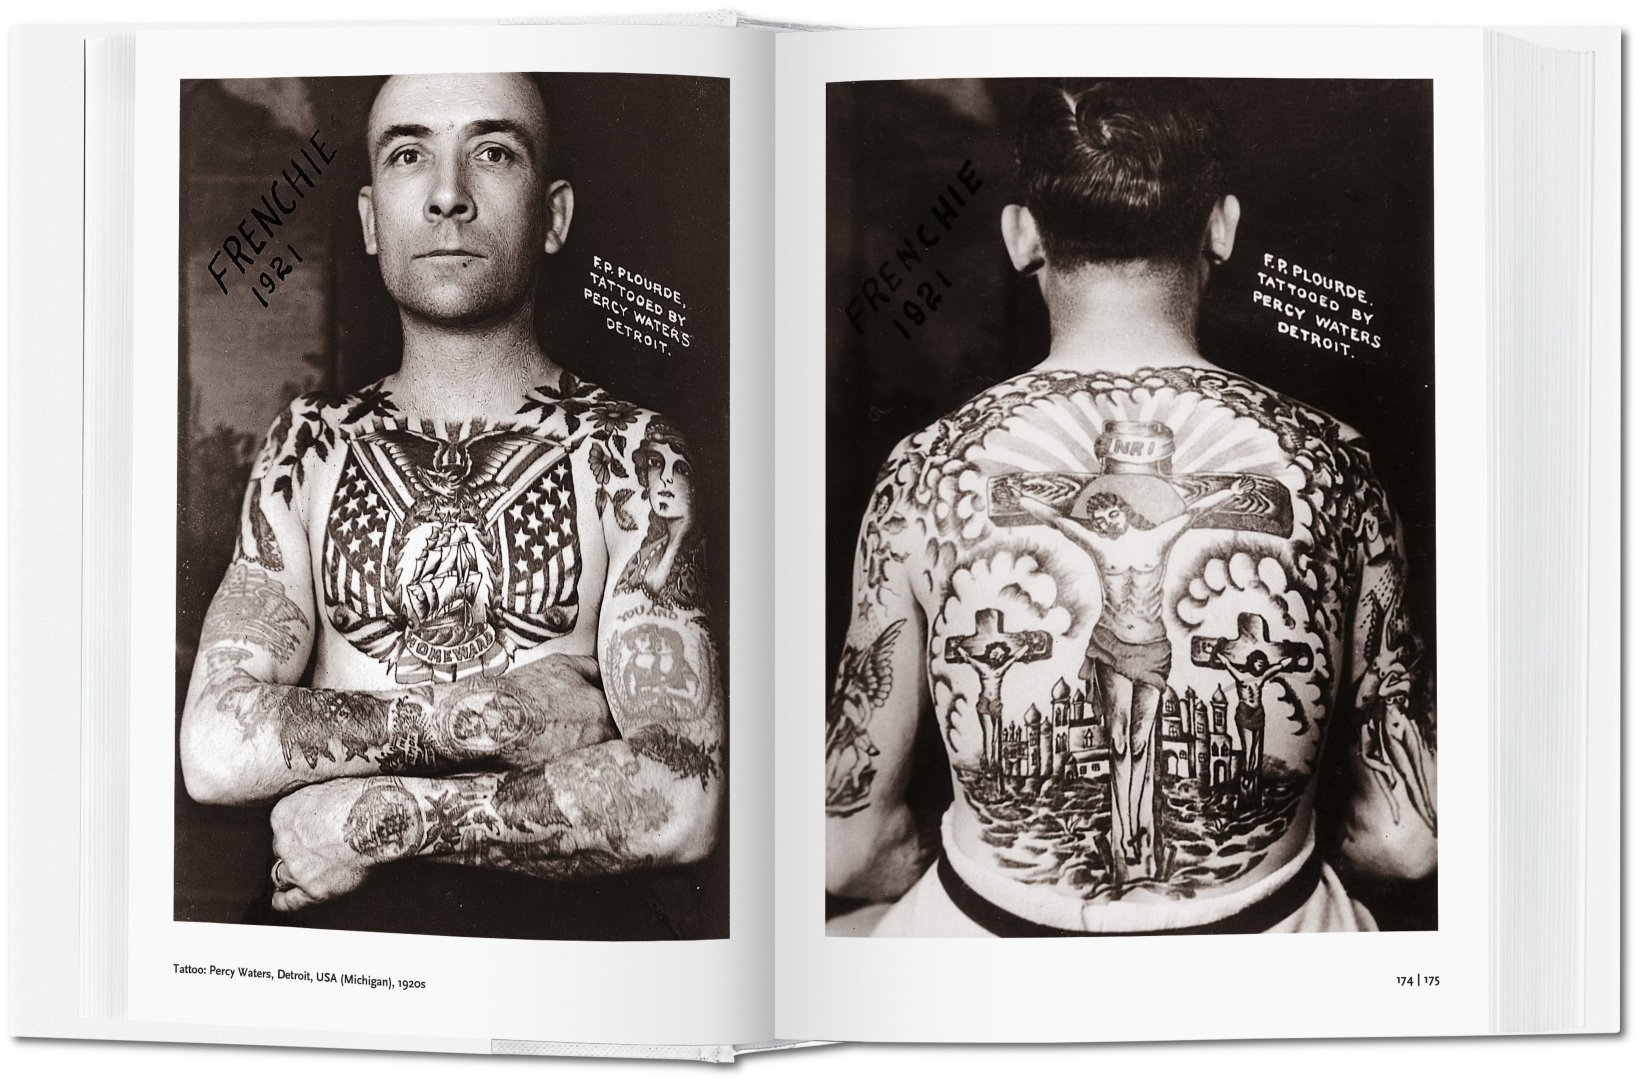 1000 tatouages tattoos livre photo taschen body decoration cadeau art